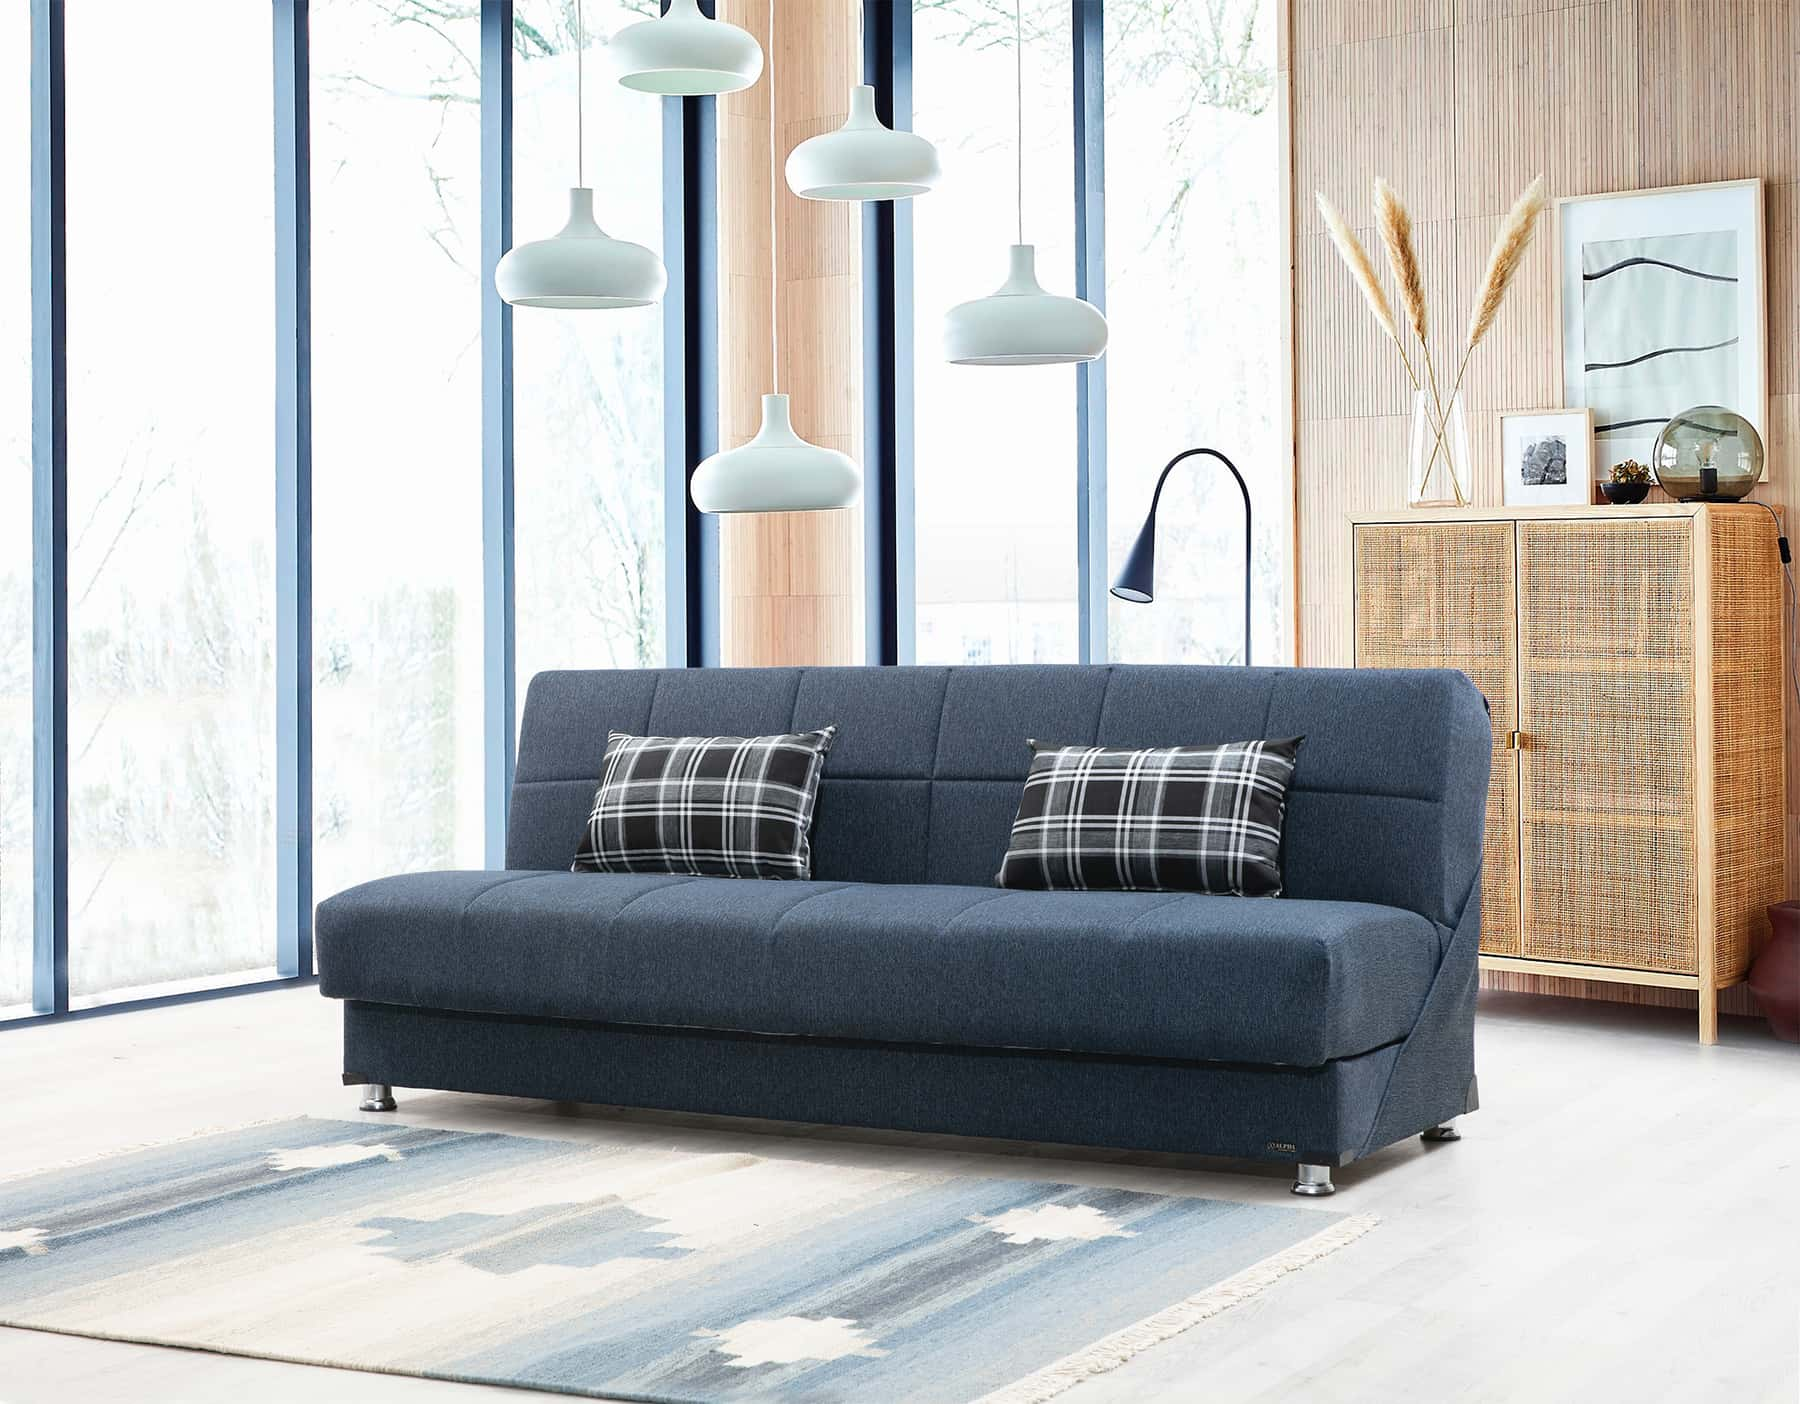 petra modern navy blue microfiber sleeper sofa bed by alpha furniture